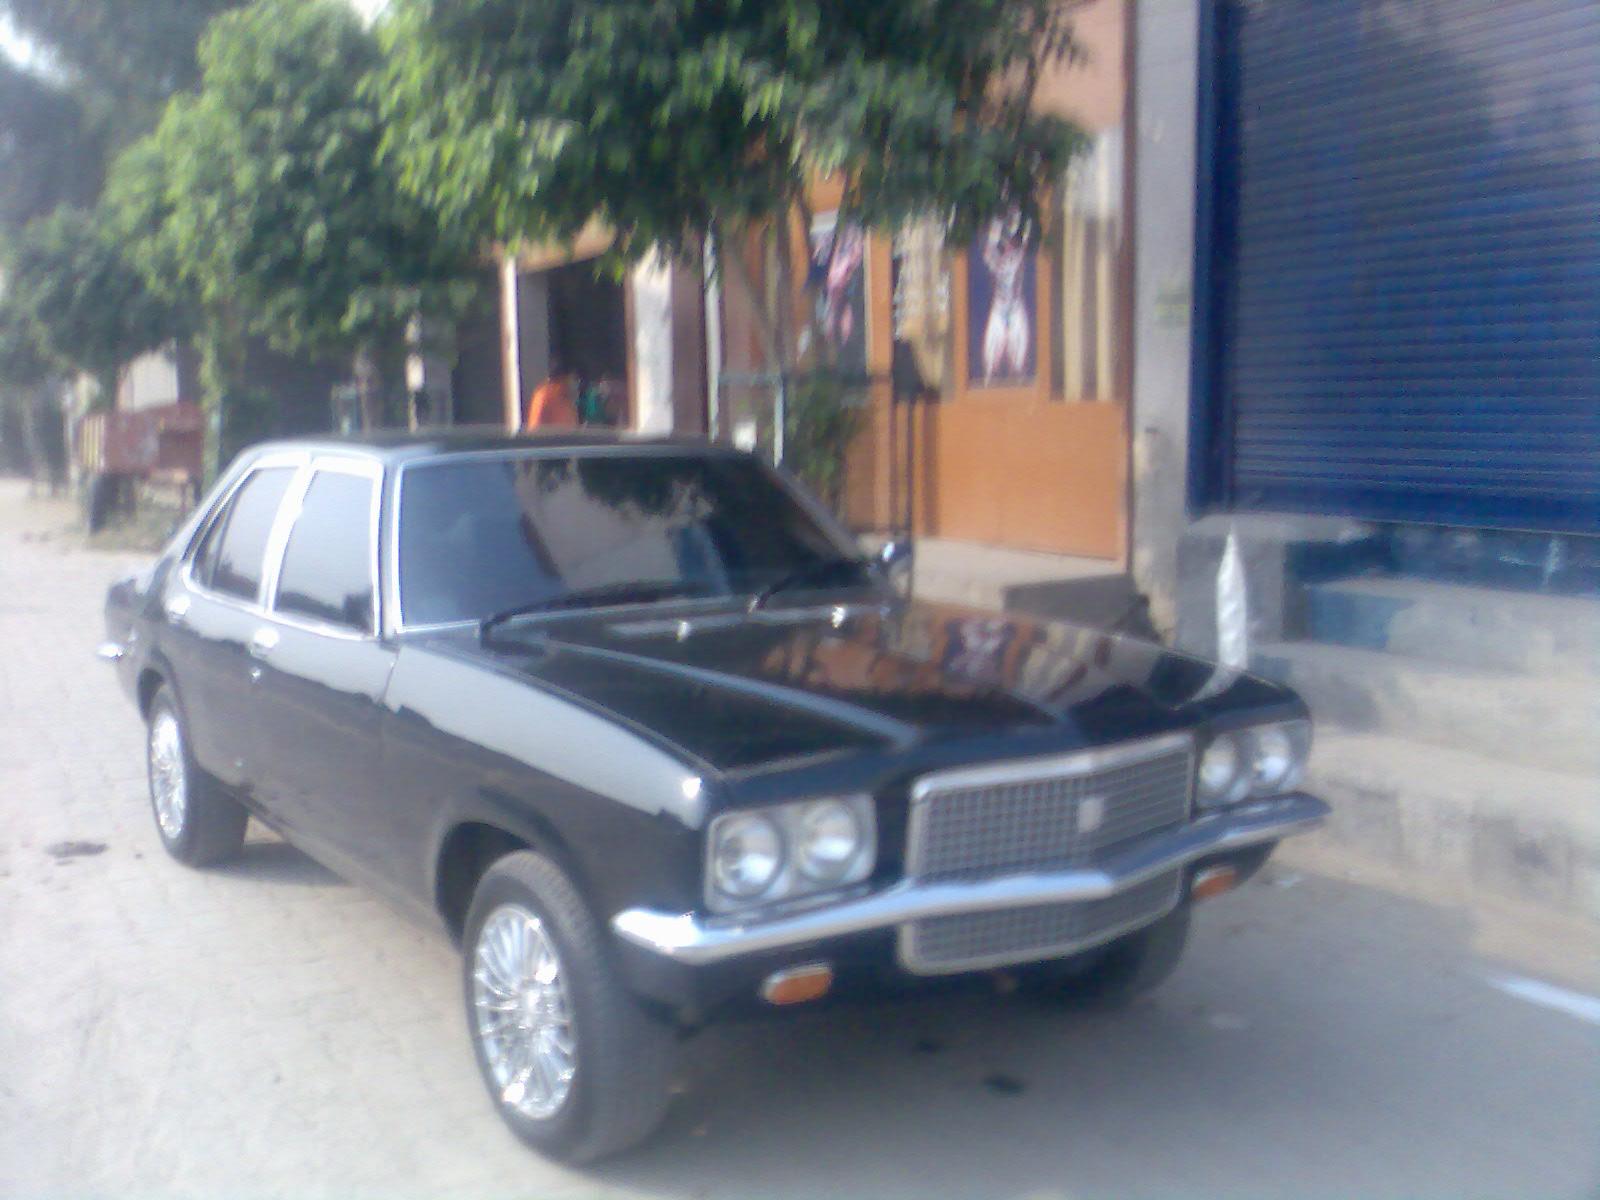 contessa classic: Hindustan Motors - Contessa Classic 1.8 GLX